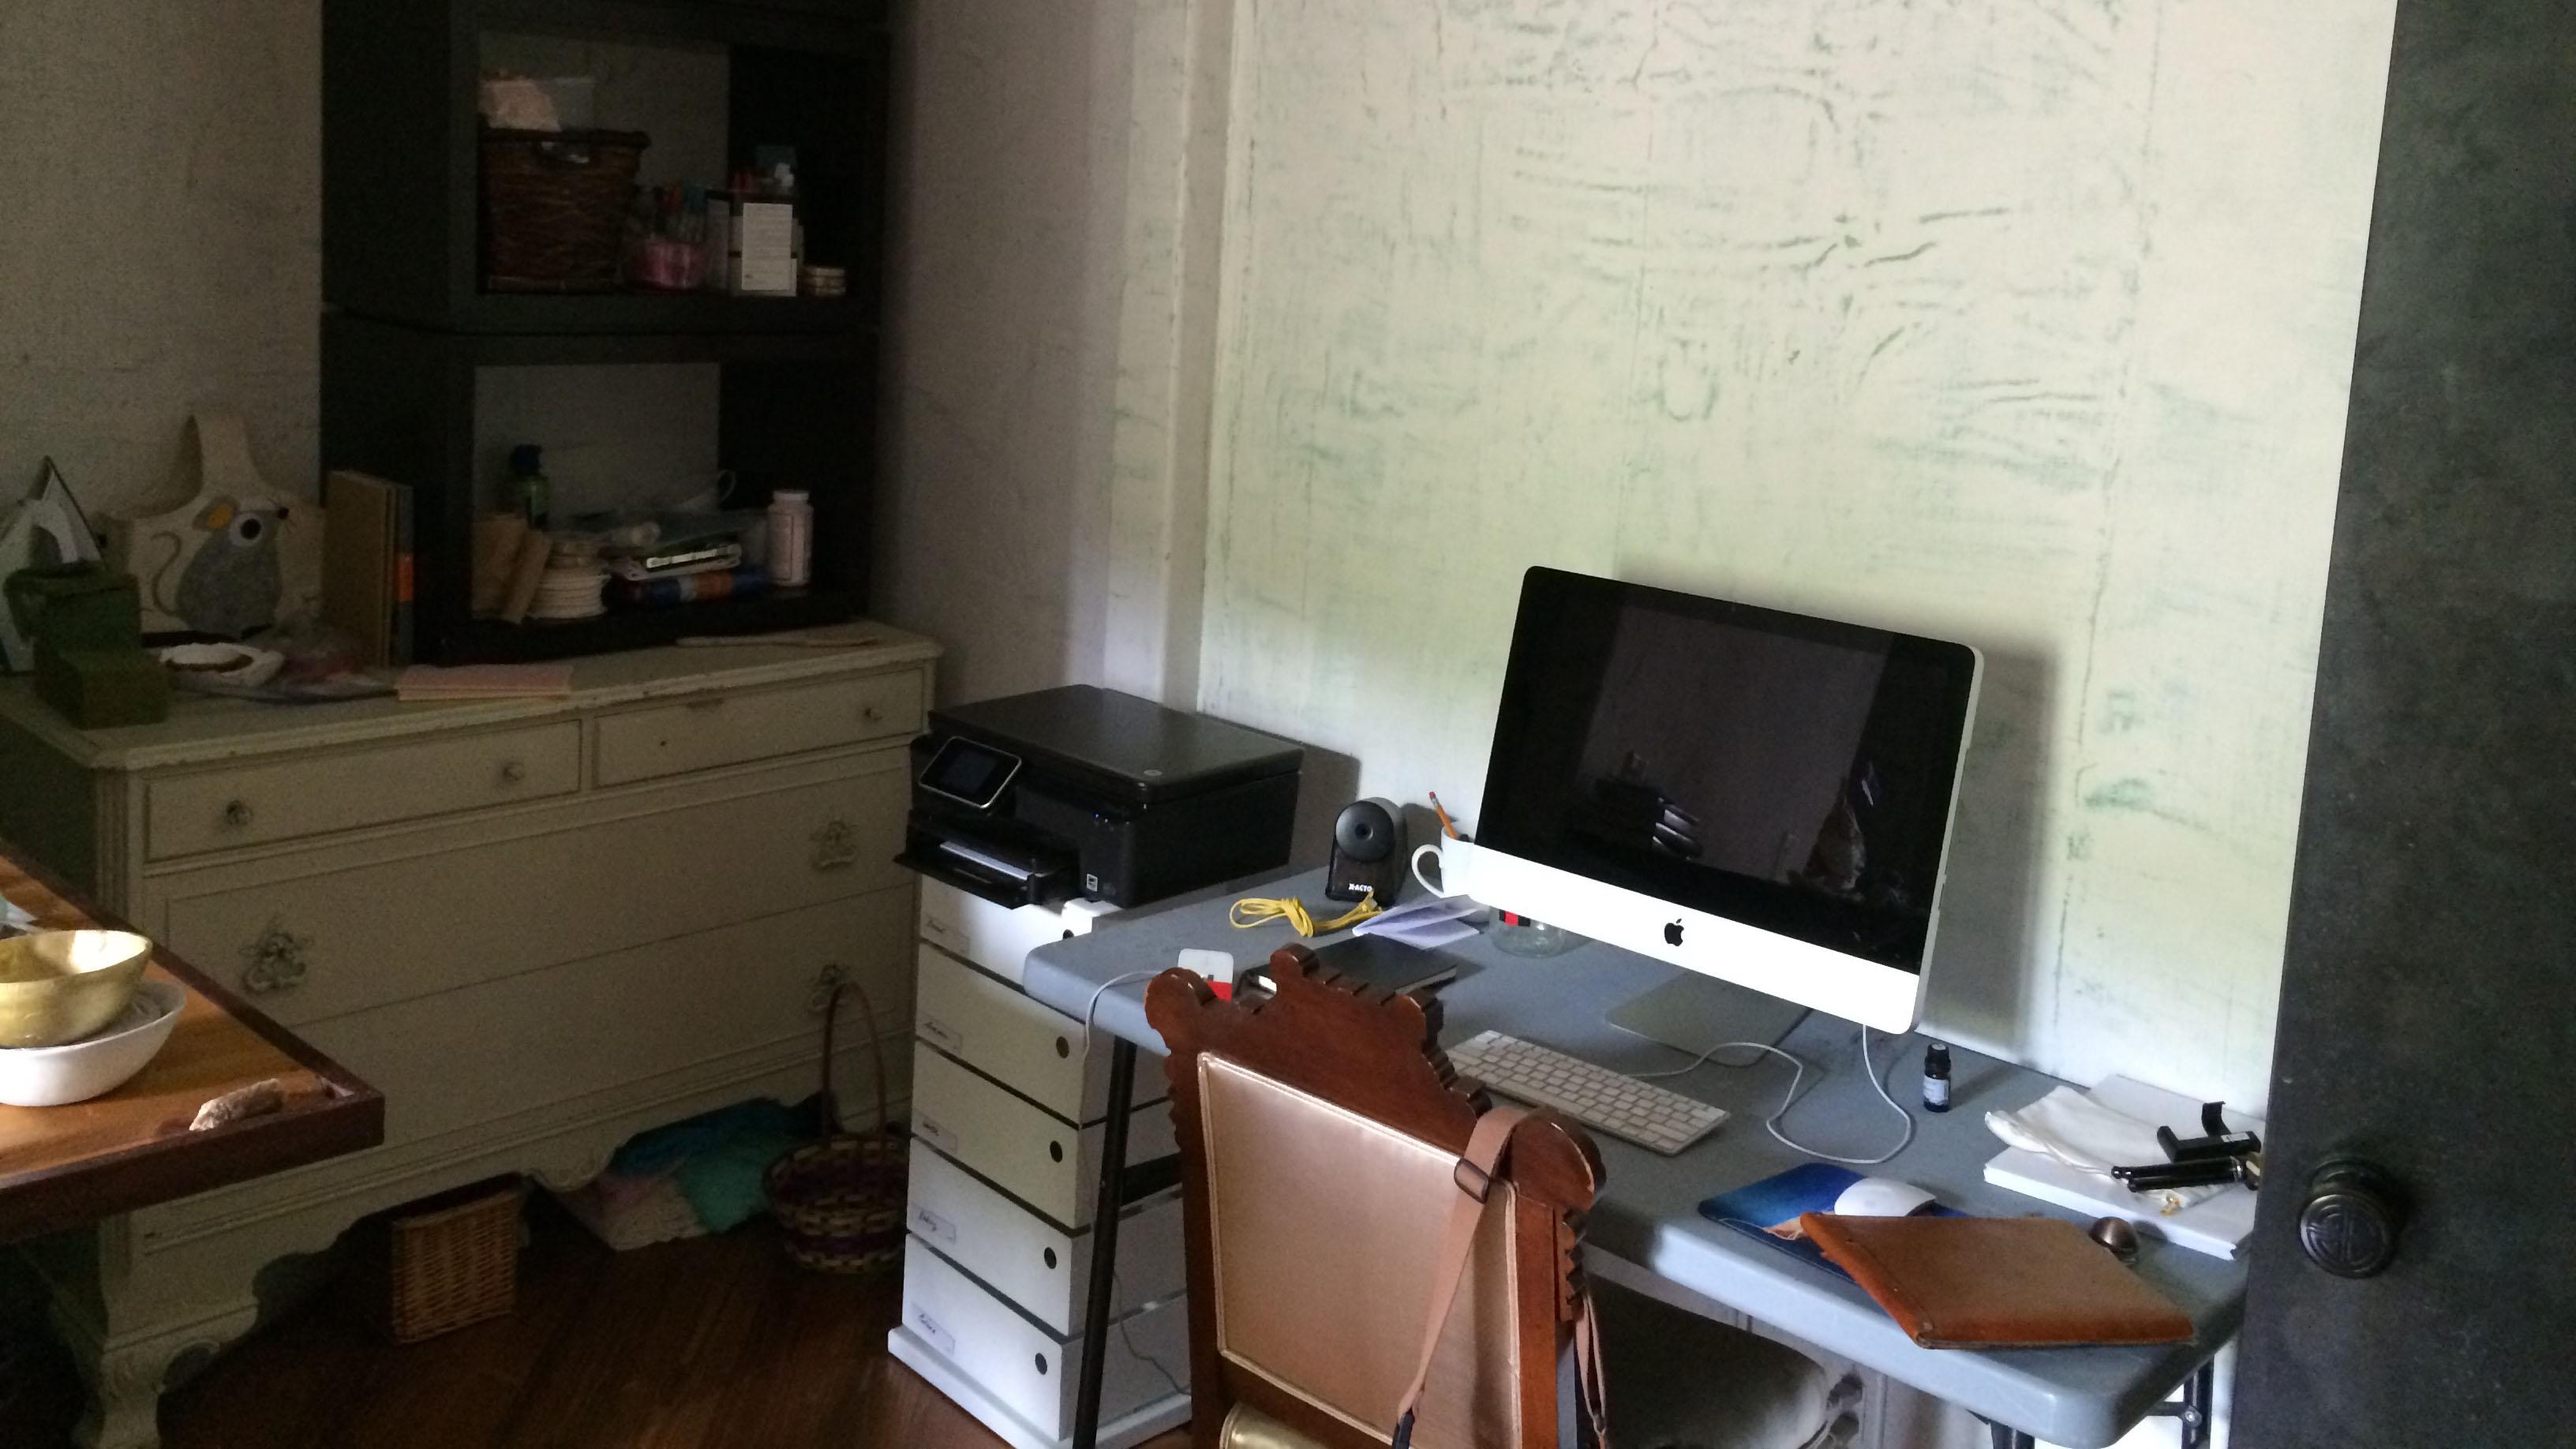 My original lackluster desk and craft supply area.